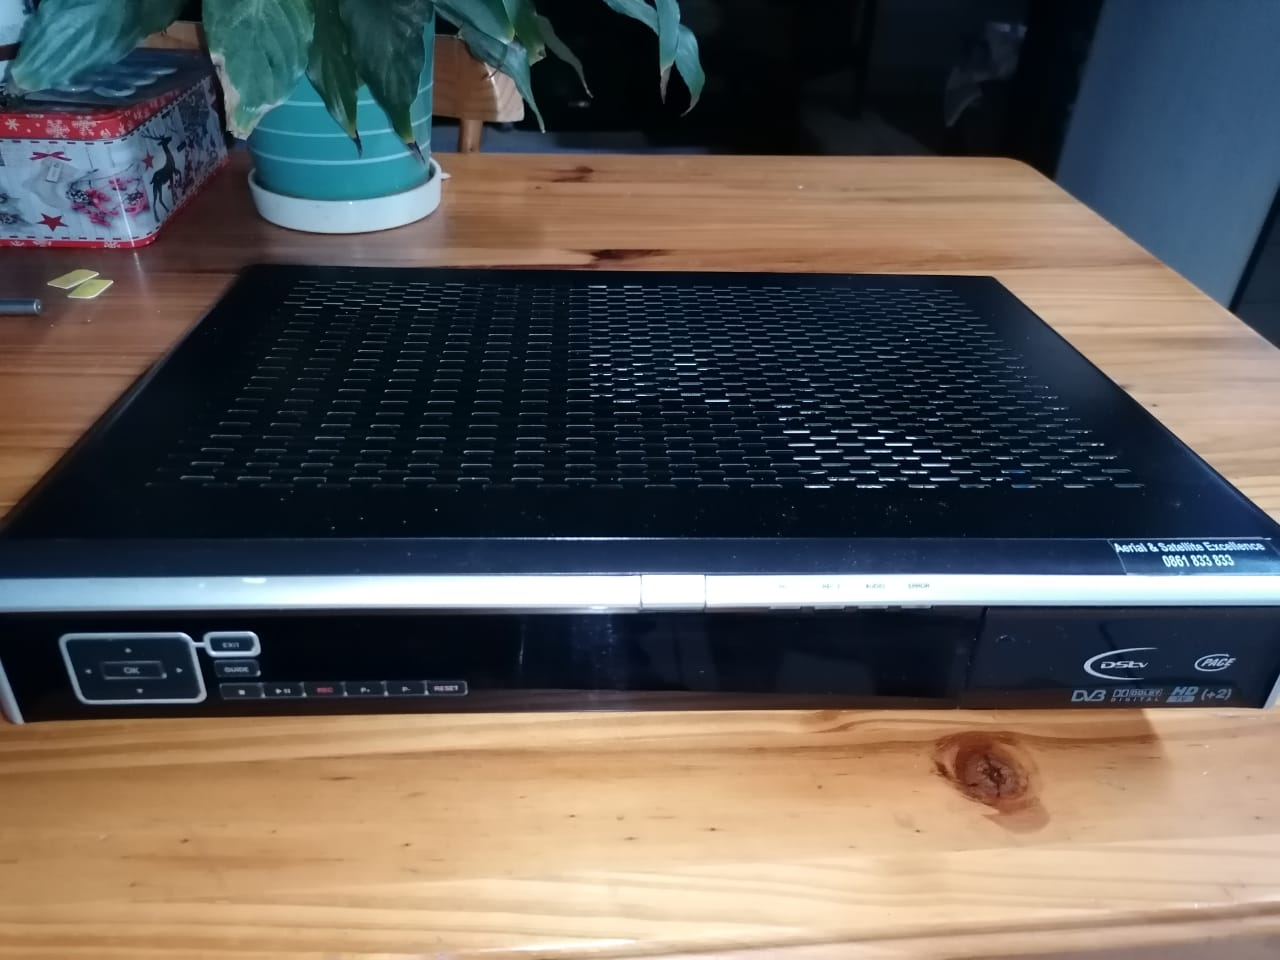 DSTV Decoder TDS 850 IMC